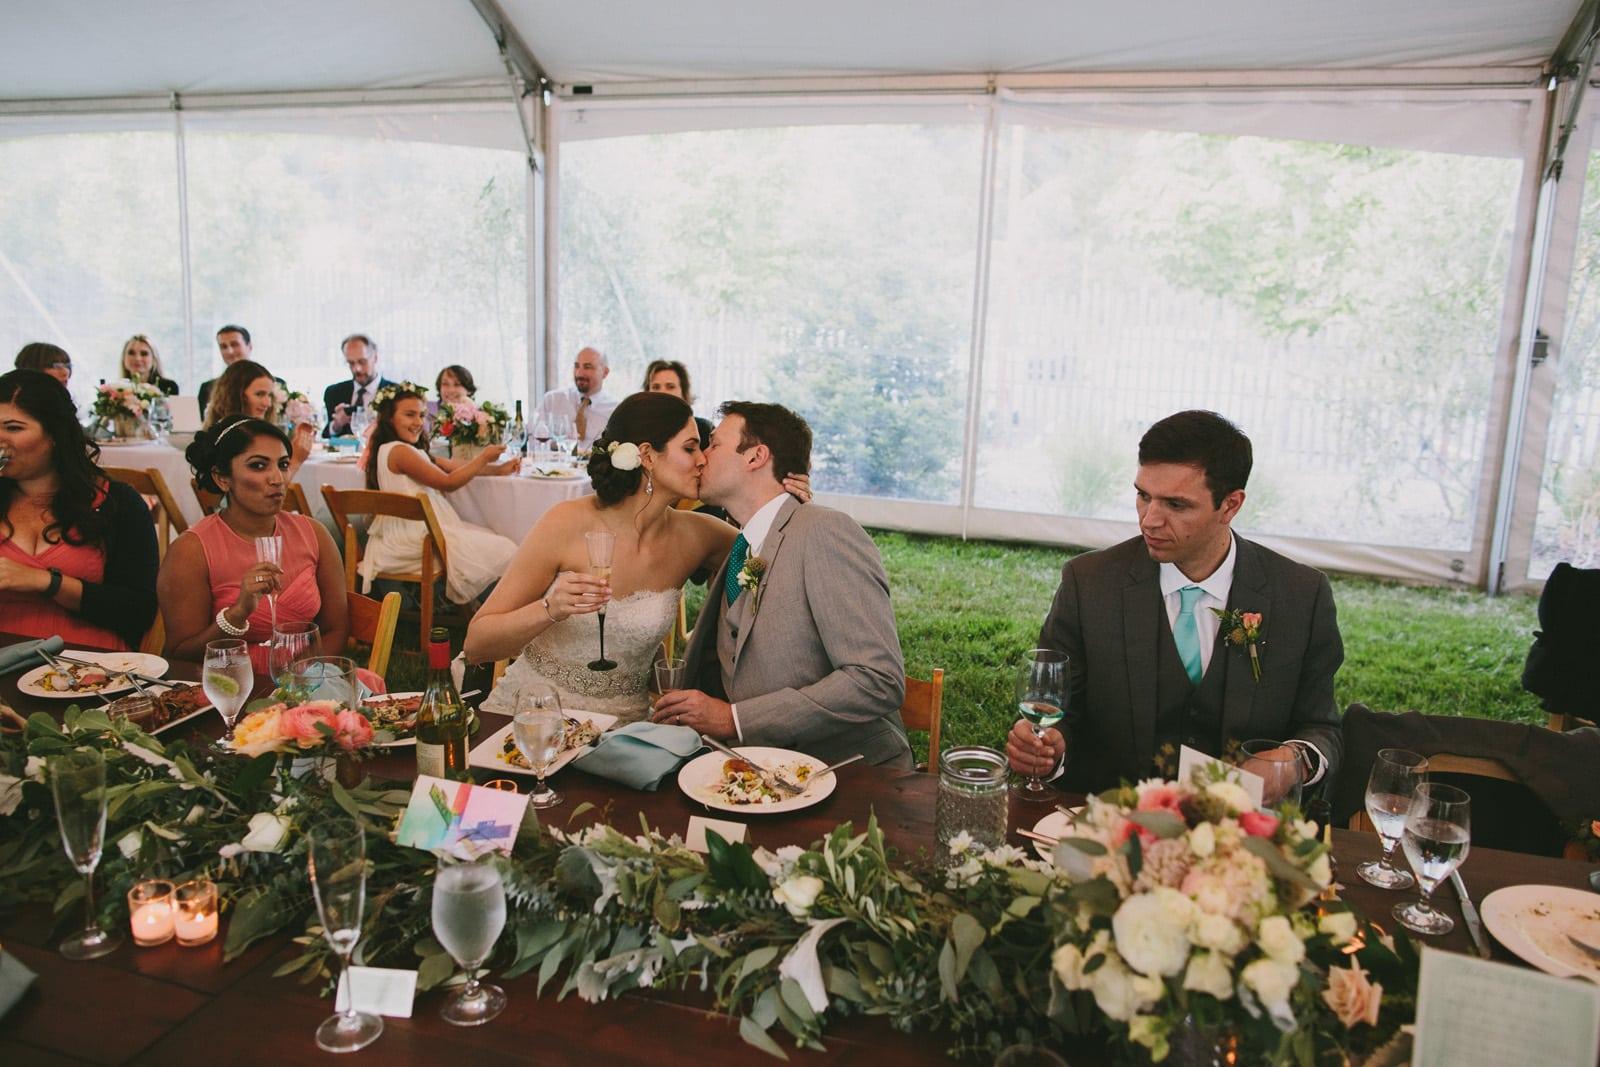 Carmel_Valley_Wedding_Gardener_Ranch_Wedding_060